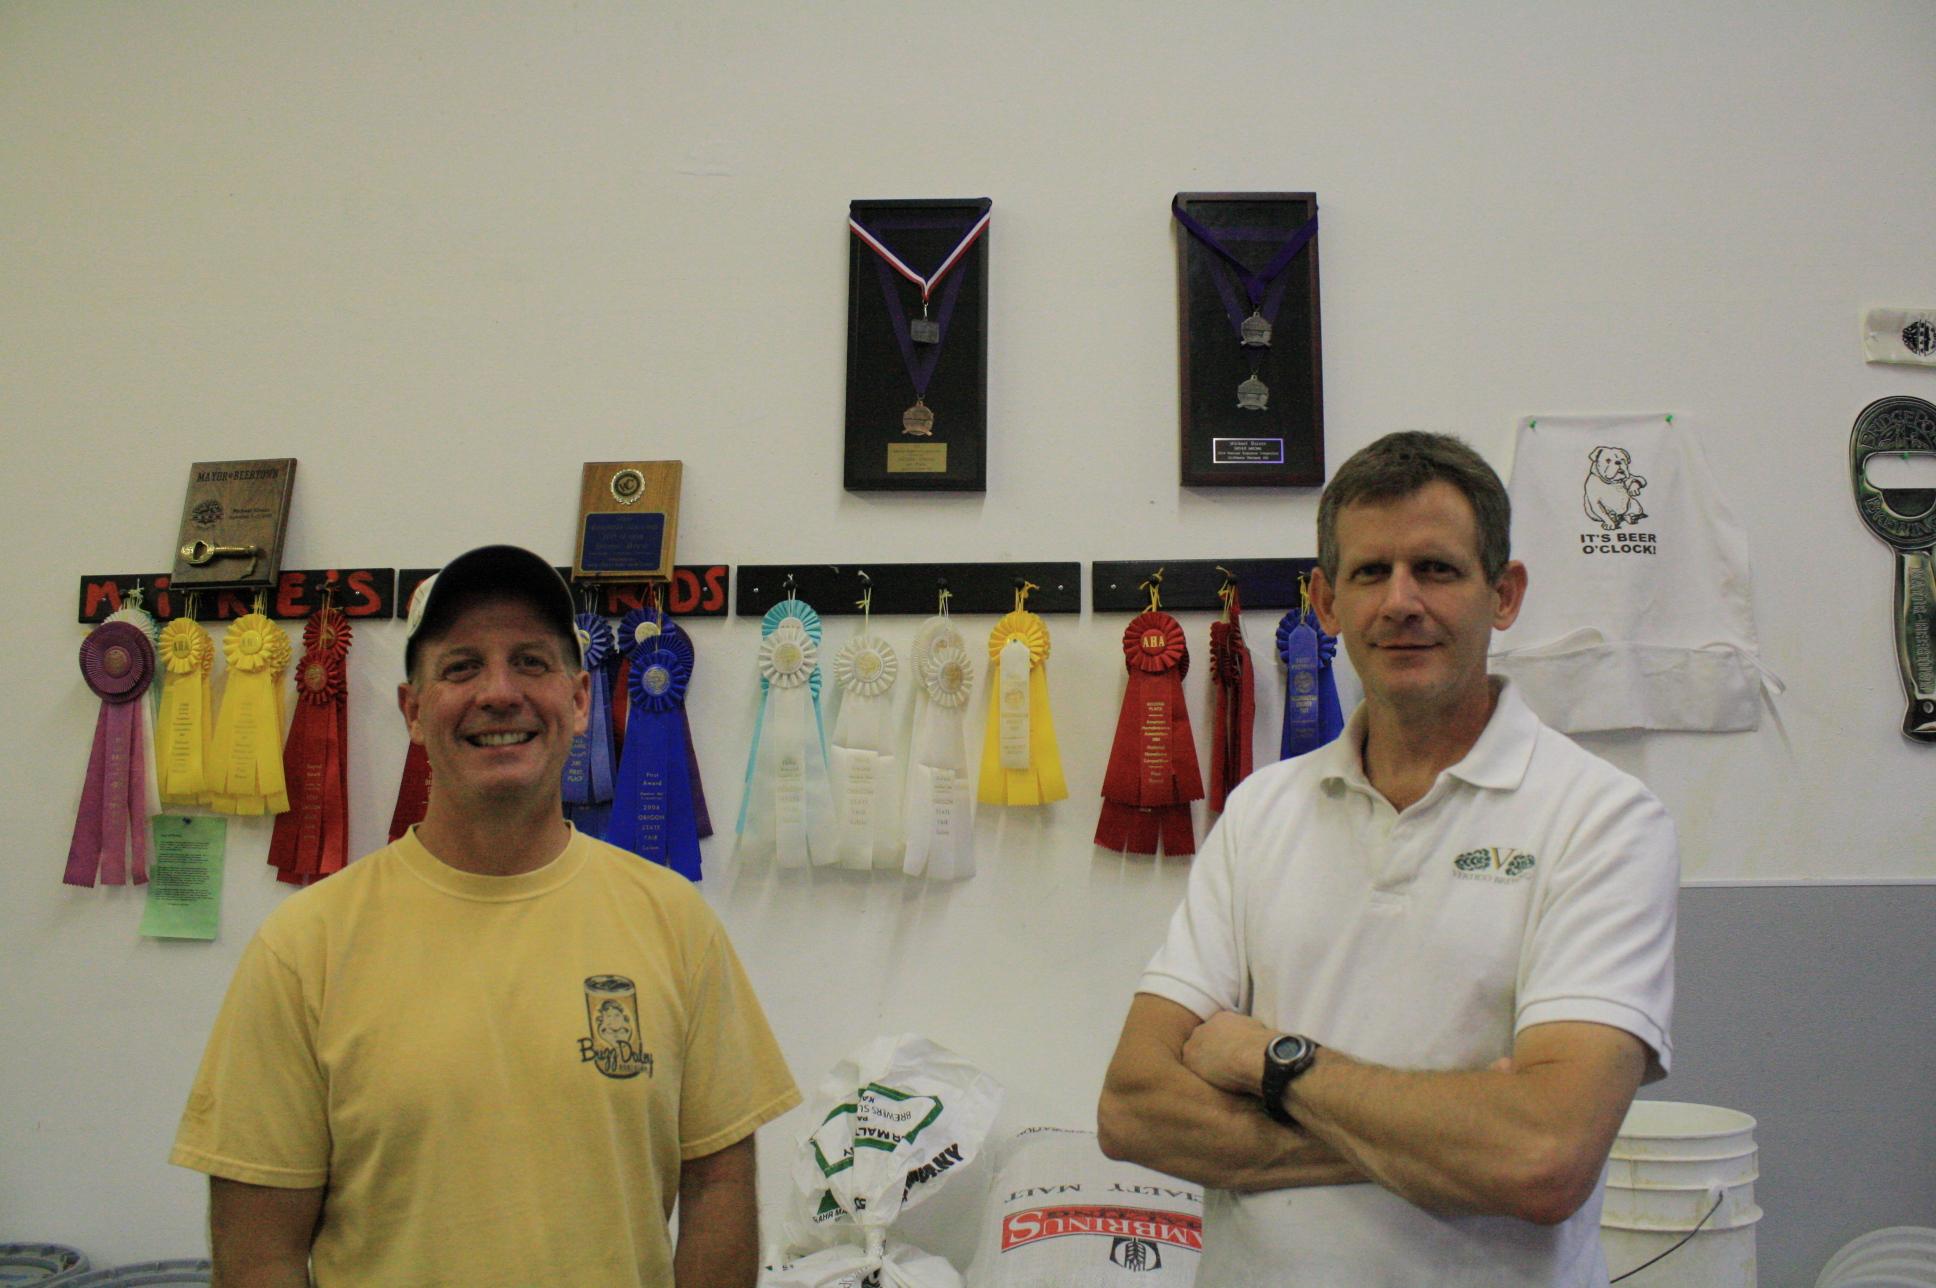 Vertigo Brewers Mike Kinion (left) and Mike Haines (right)